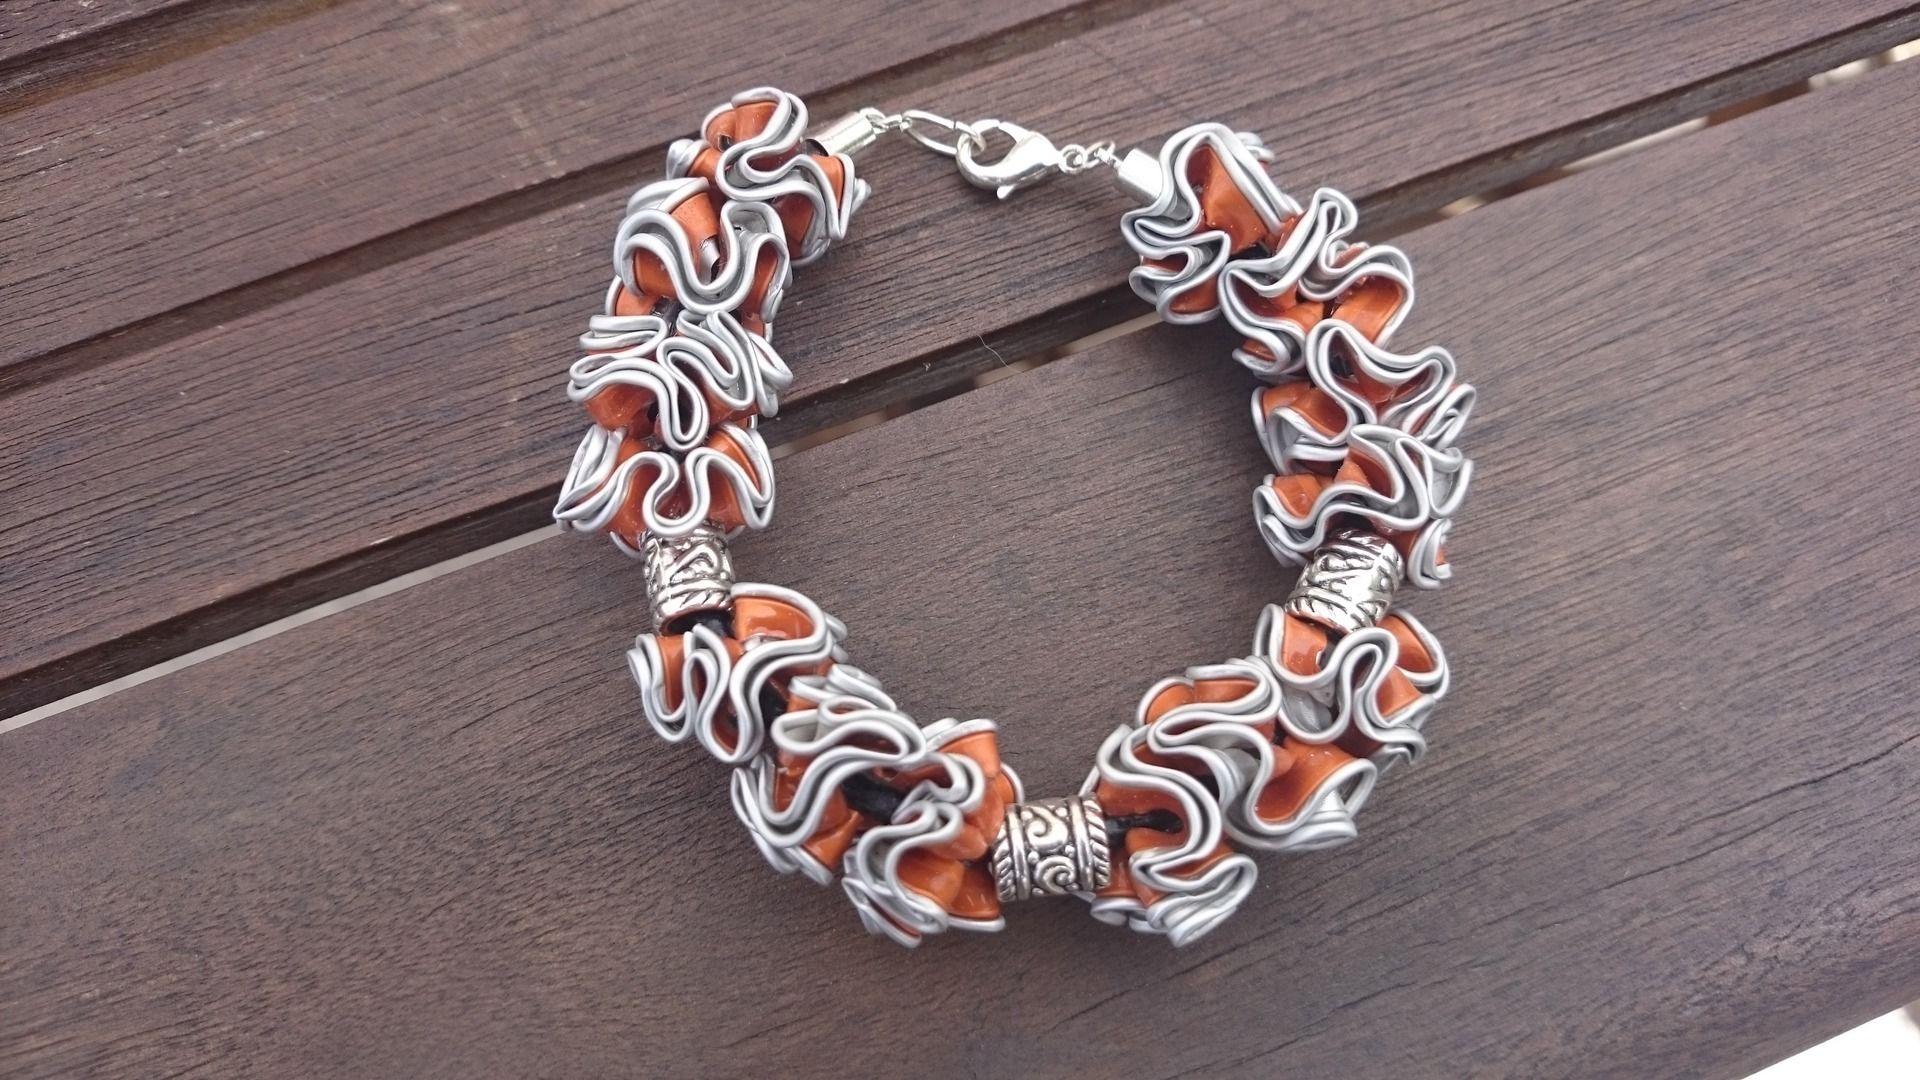 bijoux bracelet capsule caf nespresso recycl orange bracelet par cococreative bracelets. Black Bedroom Furniture Sets. Home Design Ideas